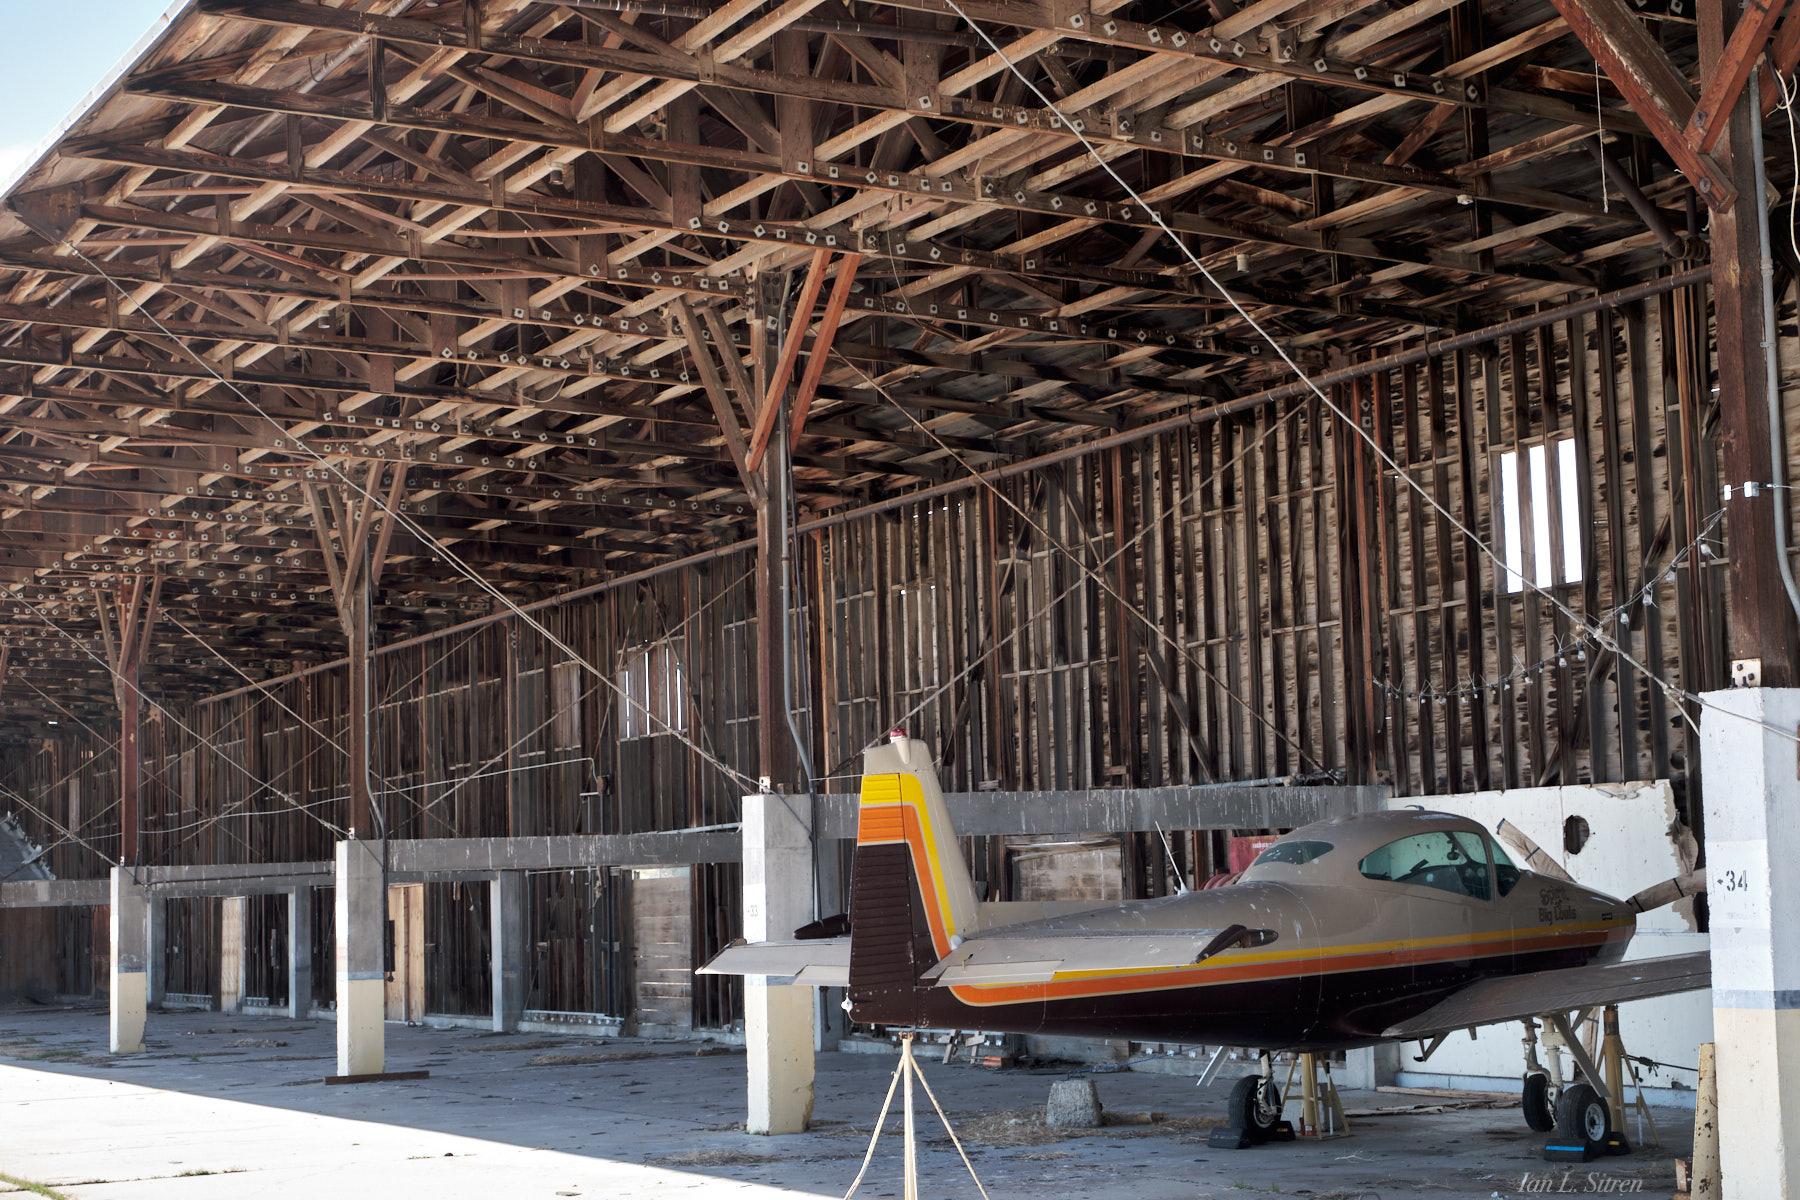 Hangar At Daggett